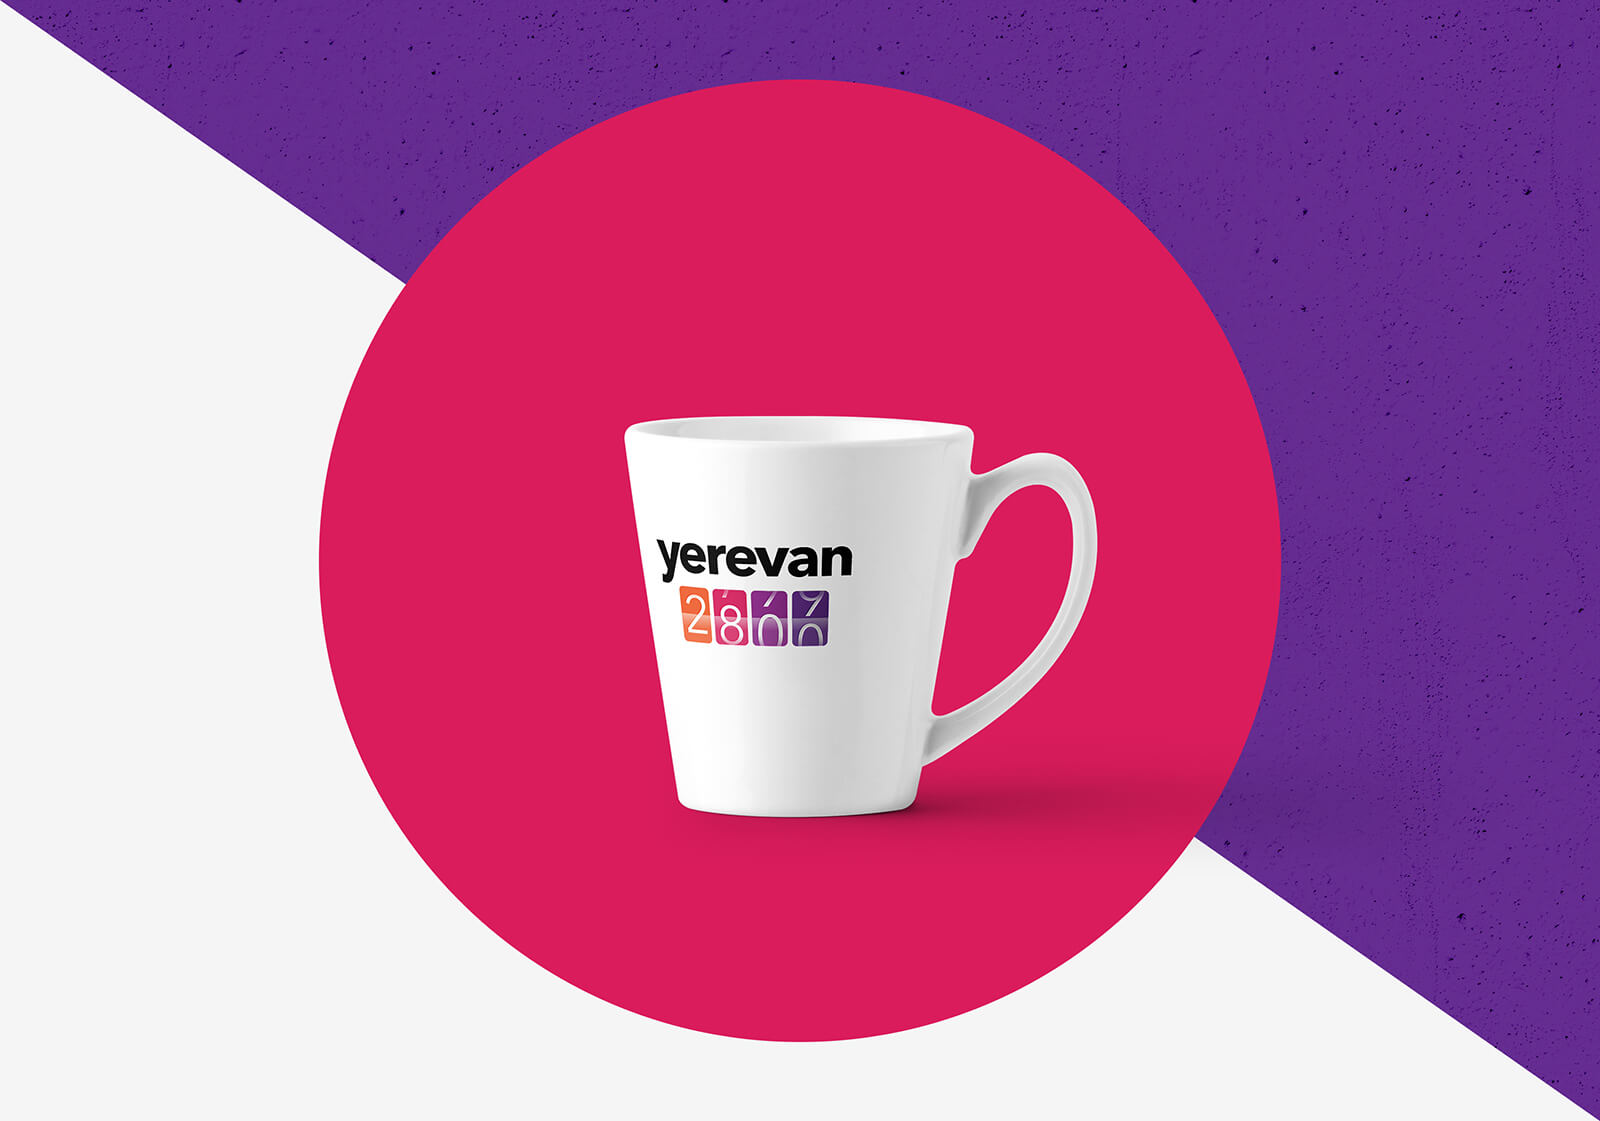 Логотип 2800-летия Еревана